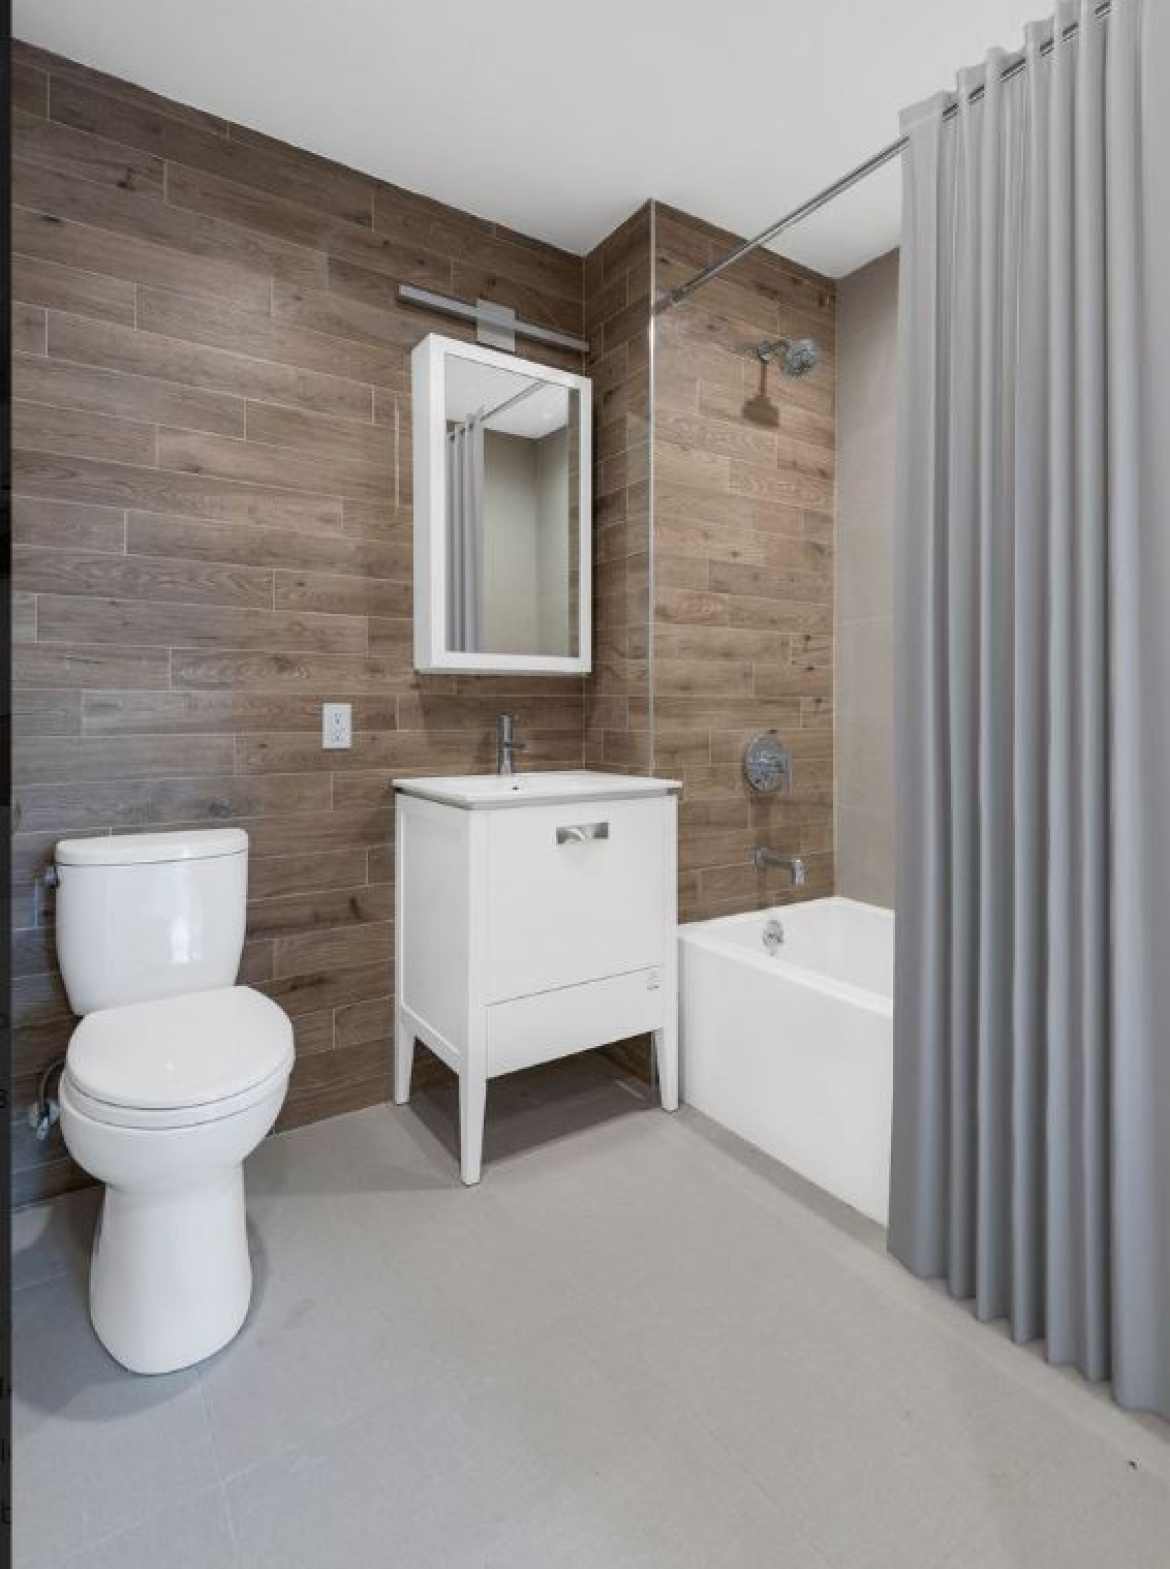 991 Ocean Avenue,Brooklyn,New York,United States 11226,2 Bedrooms Bedrooms,2 BathroomsBathrooms,Apartment,1045